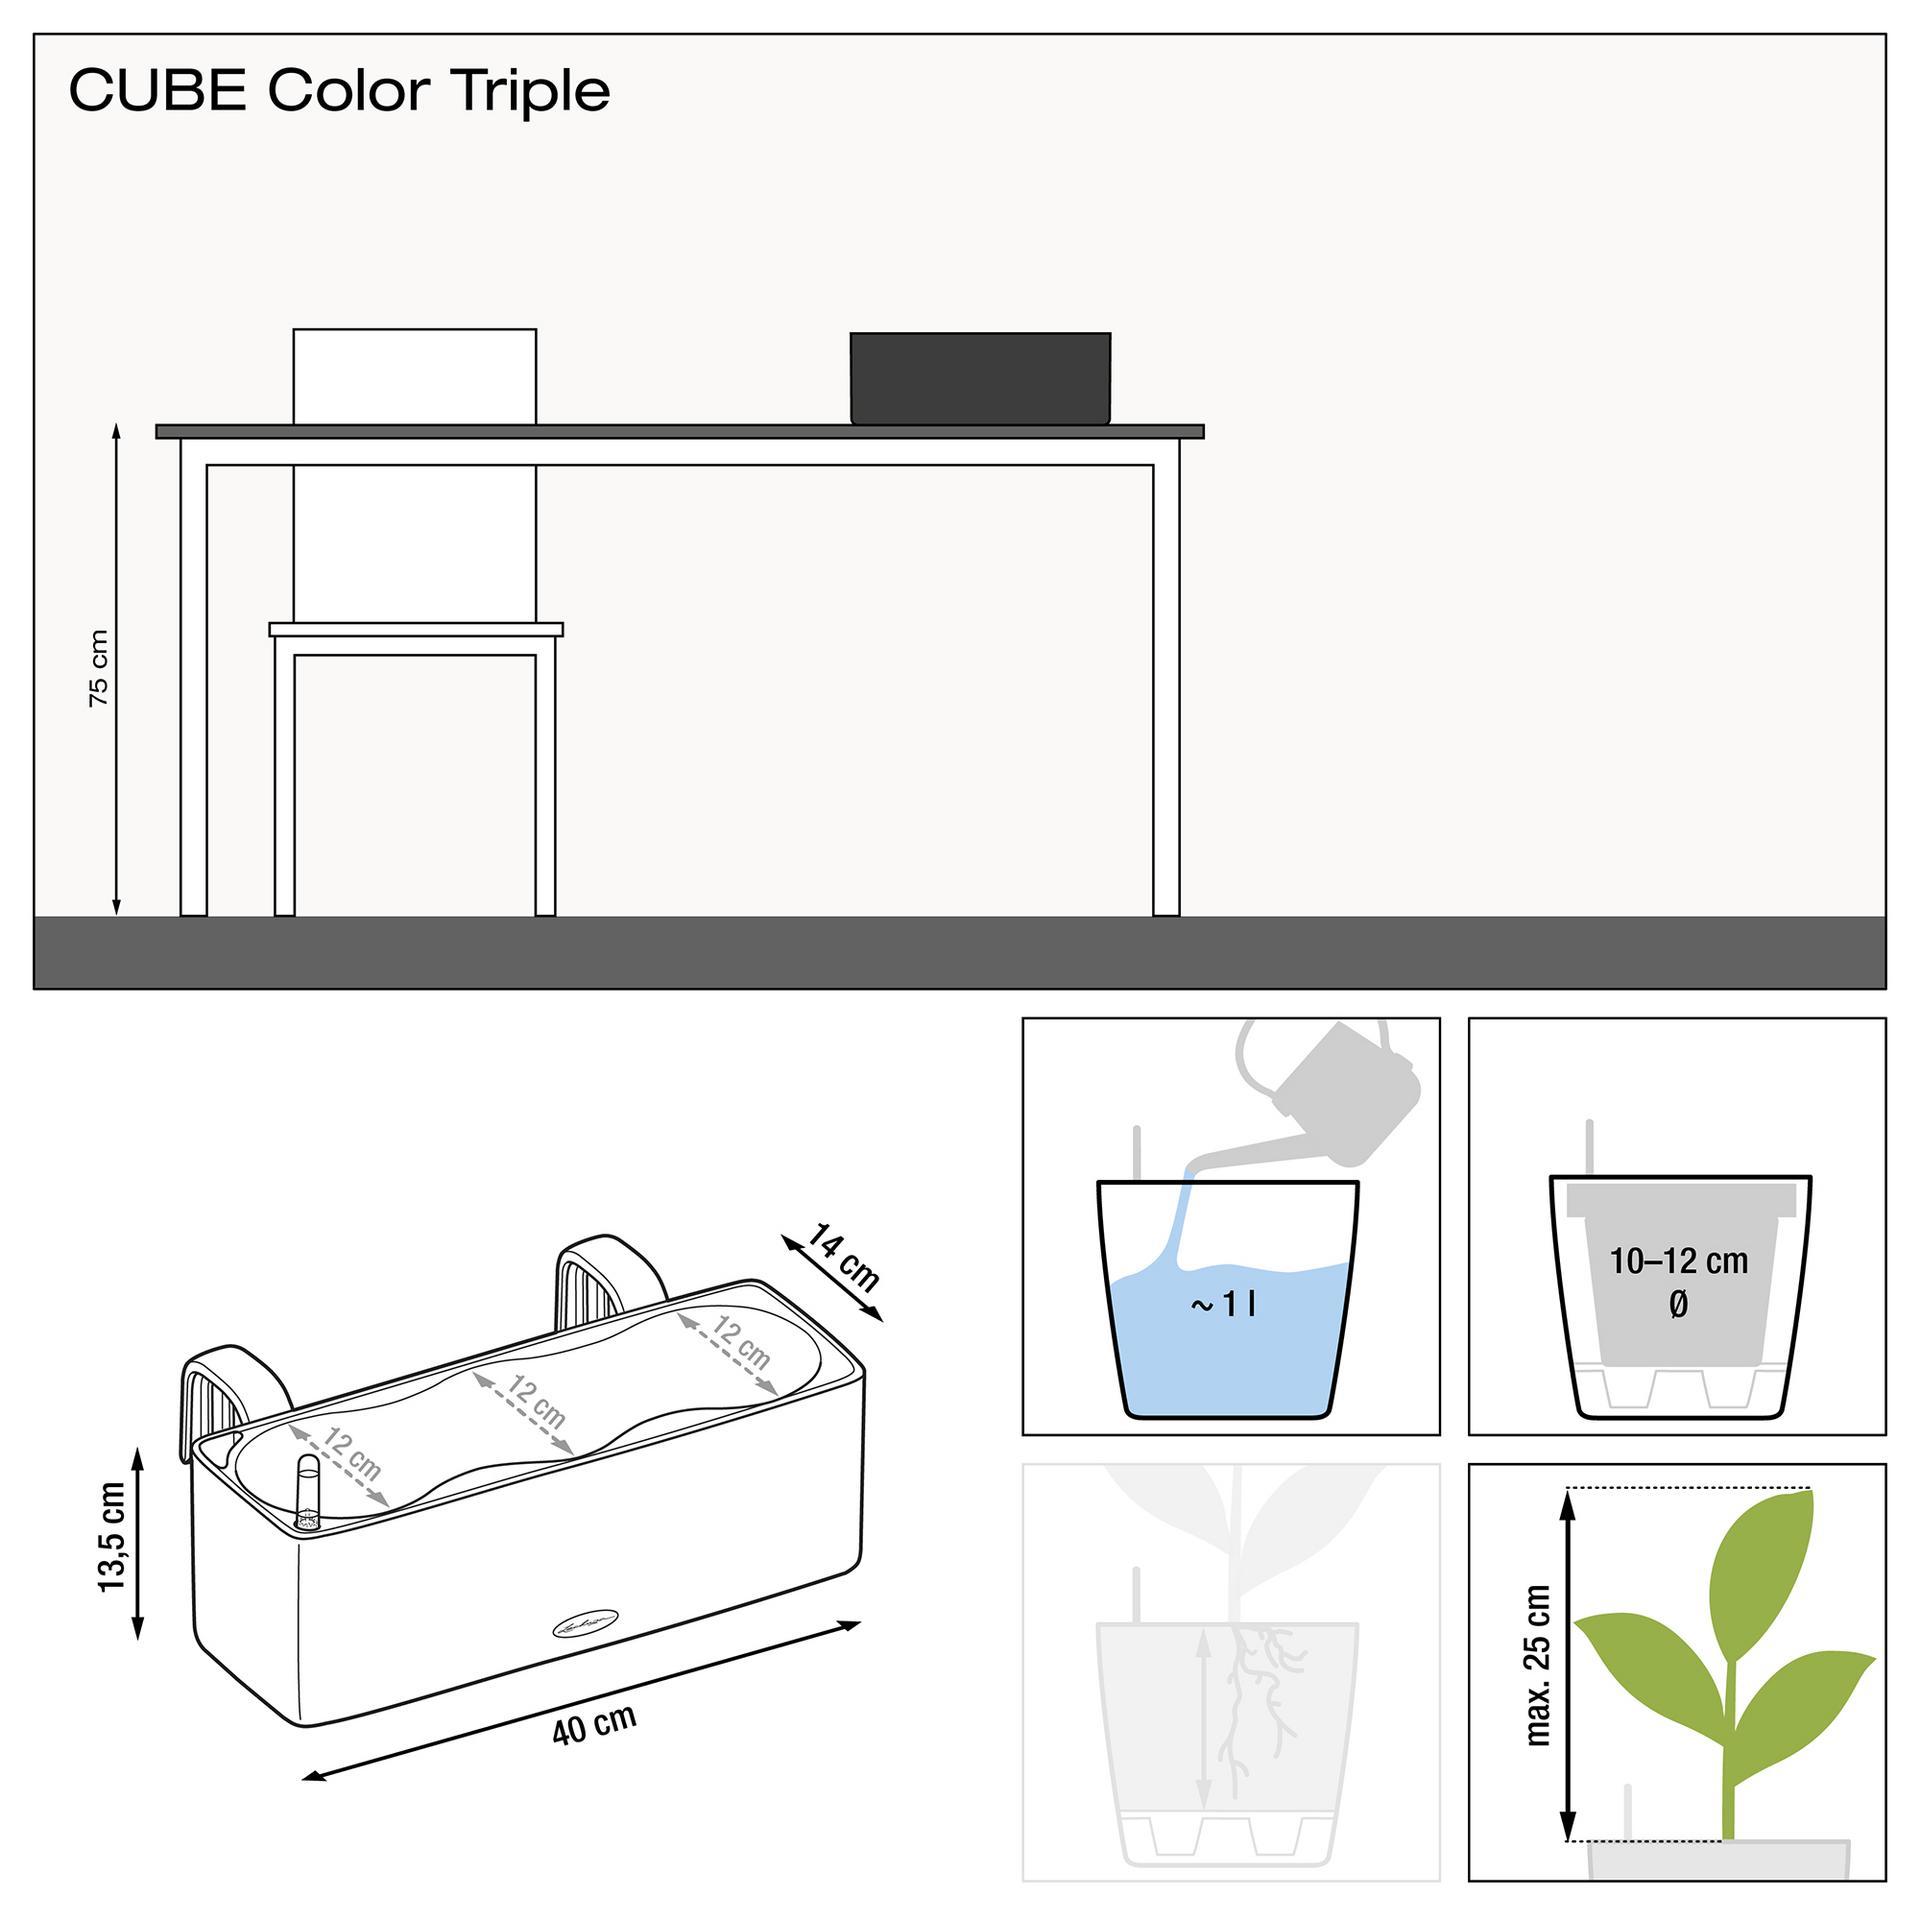 LECHUZA CUBE Color Triple weiß 40 x 14 x 13,5 cm, Balkonkasten